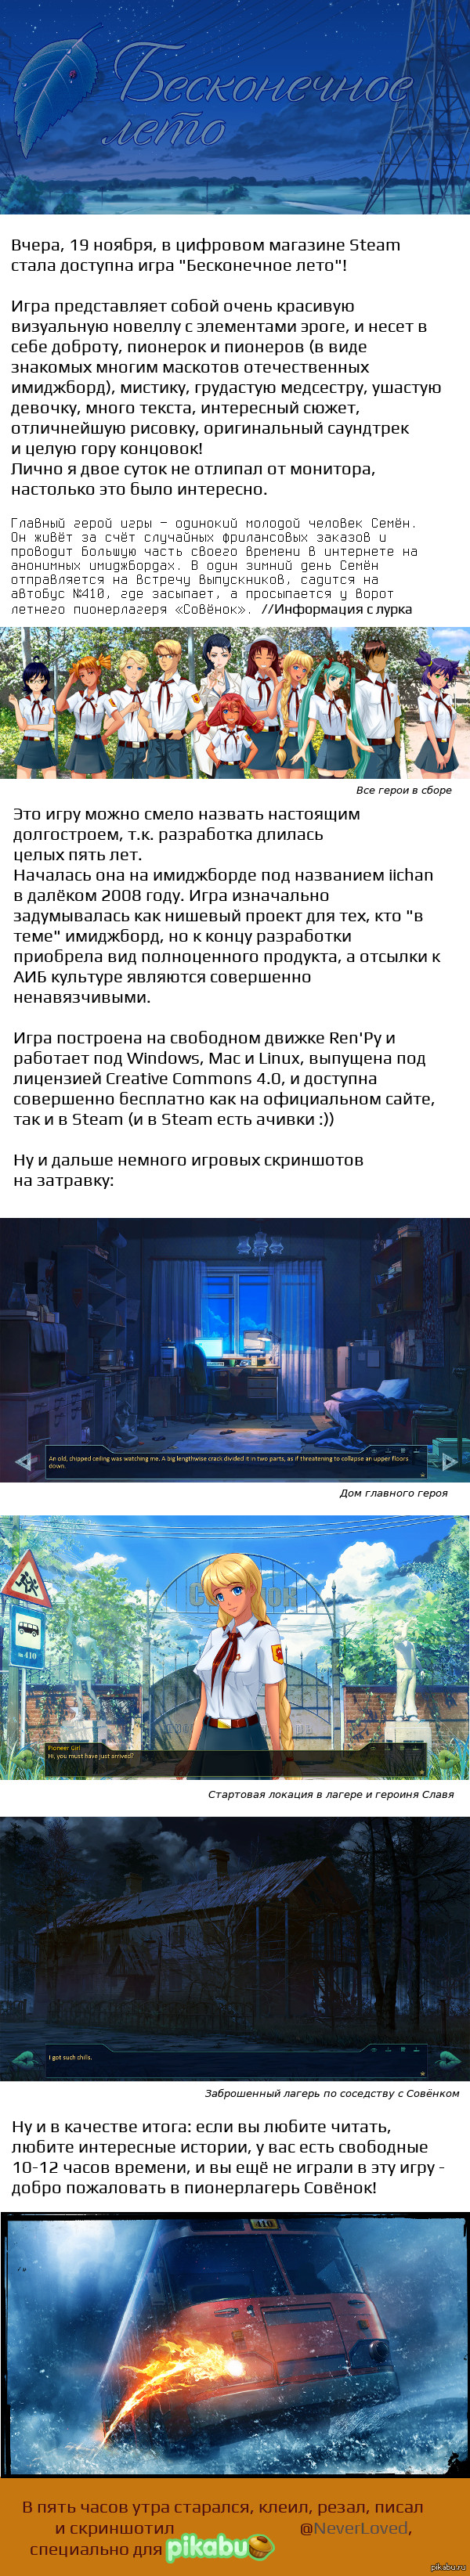 Бесконечное лето - теперь в Steam! http://store.steampowered.com/app/331470/